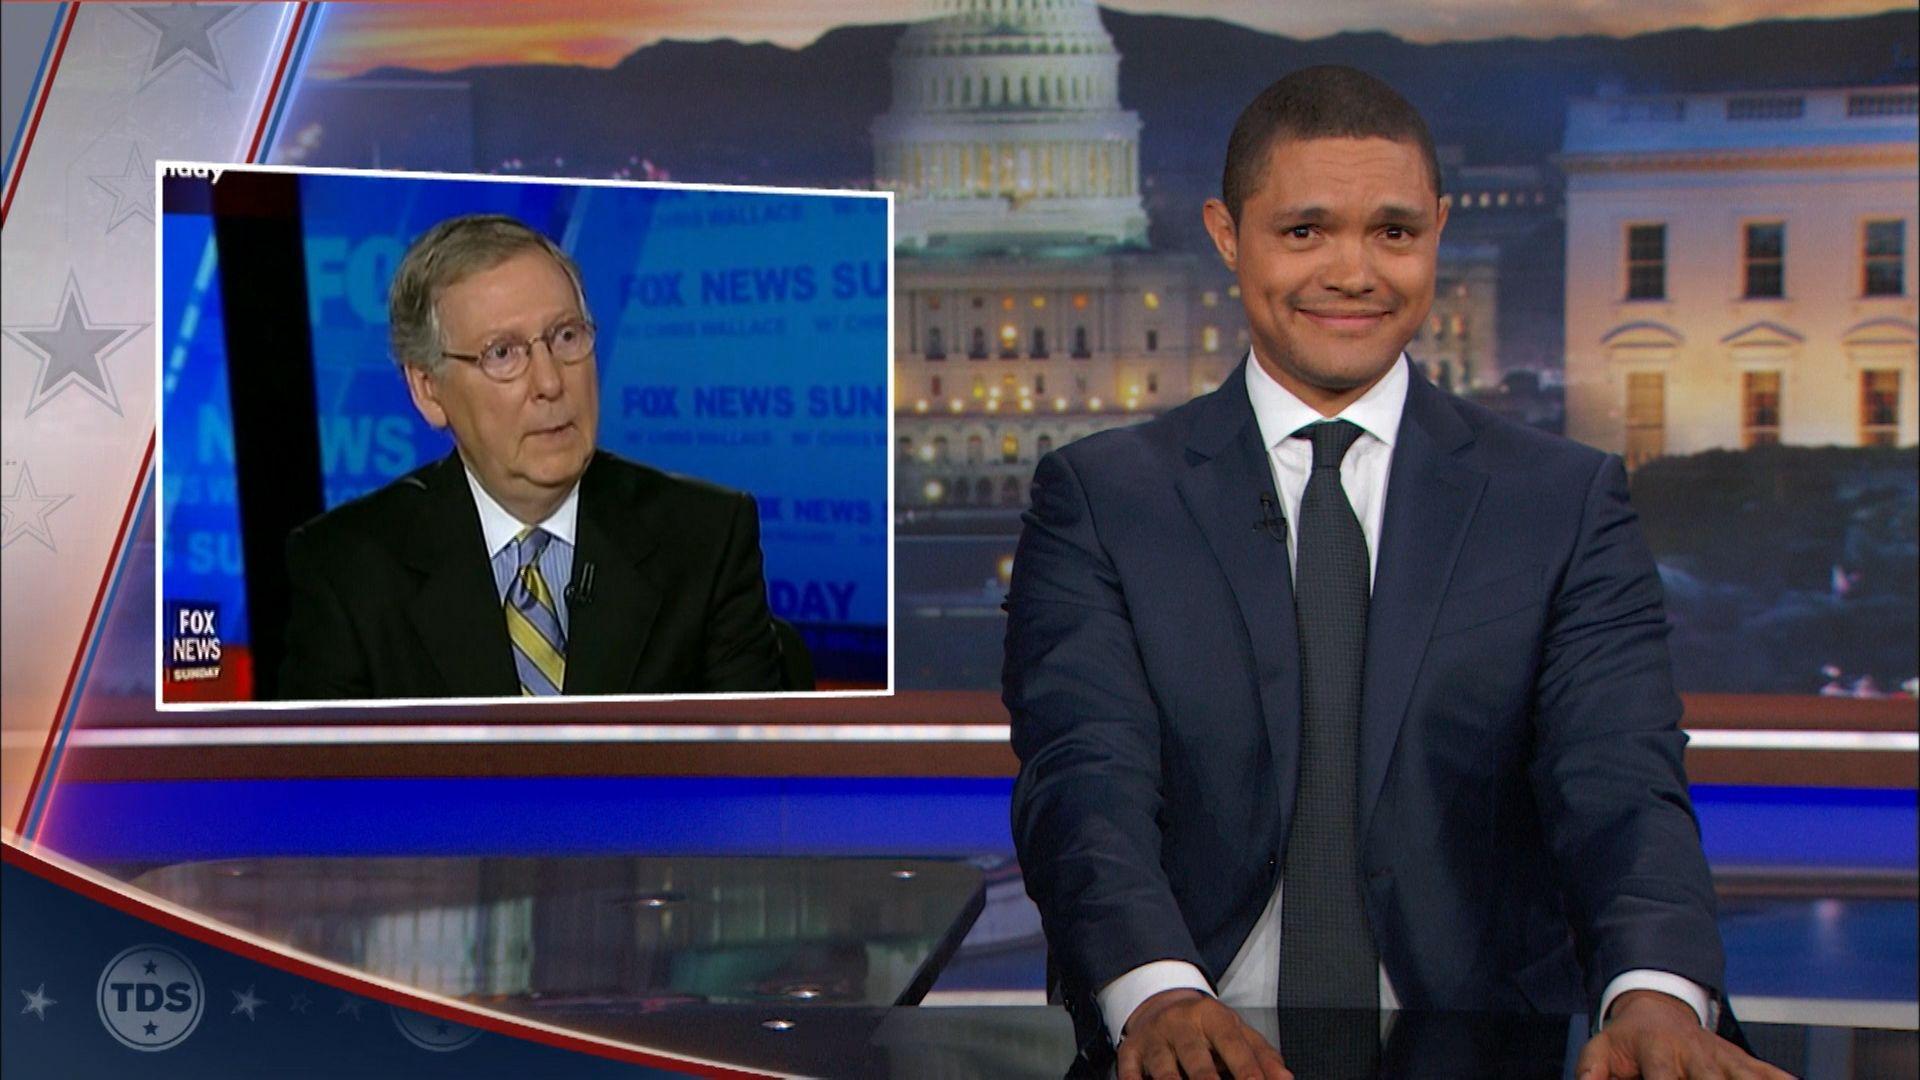 The Daily Show with Trevor Noah - January 5, 2017 - Keegan-Michael ...